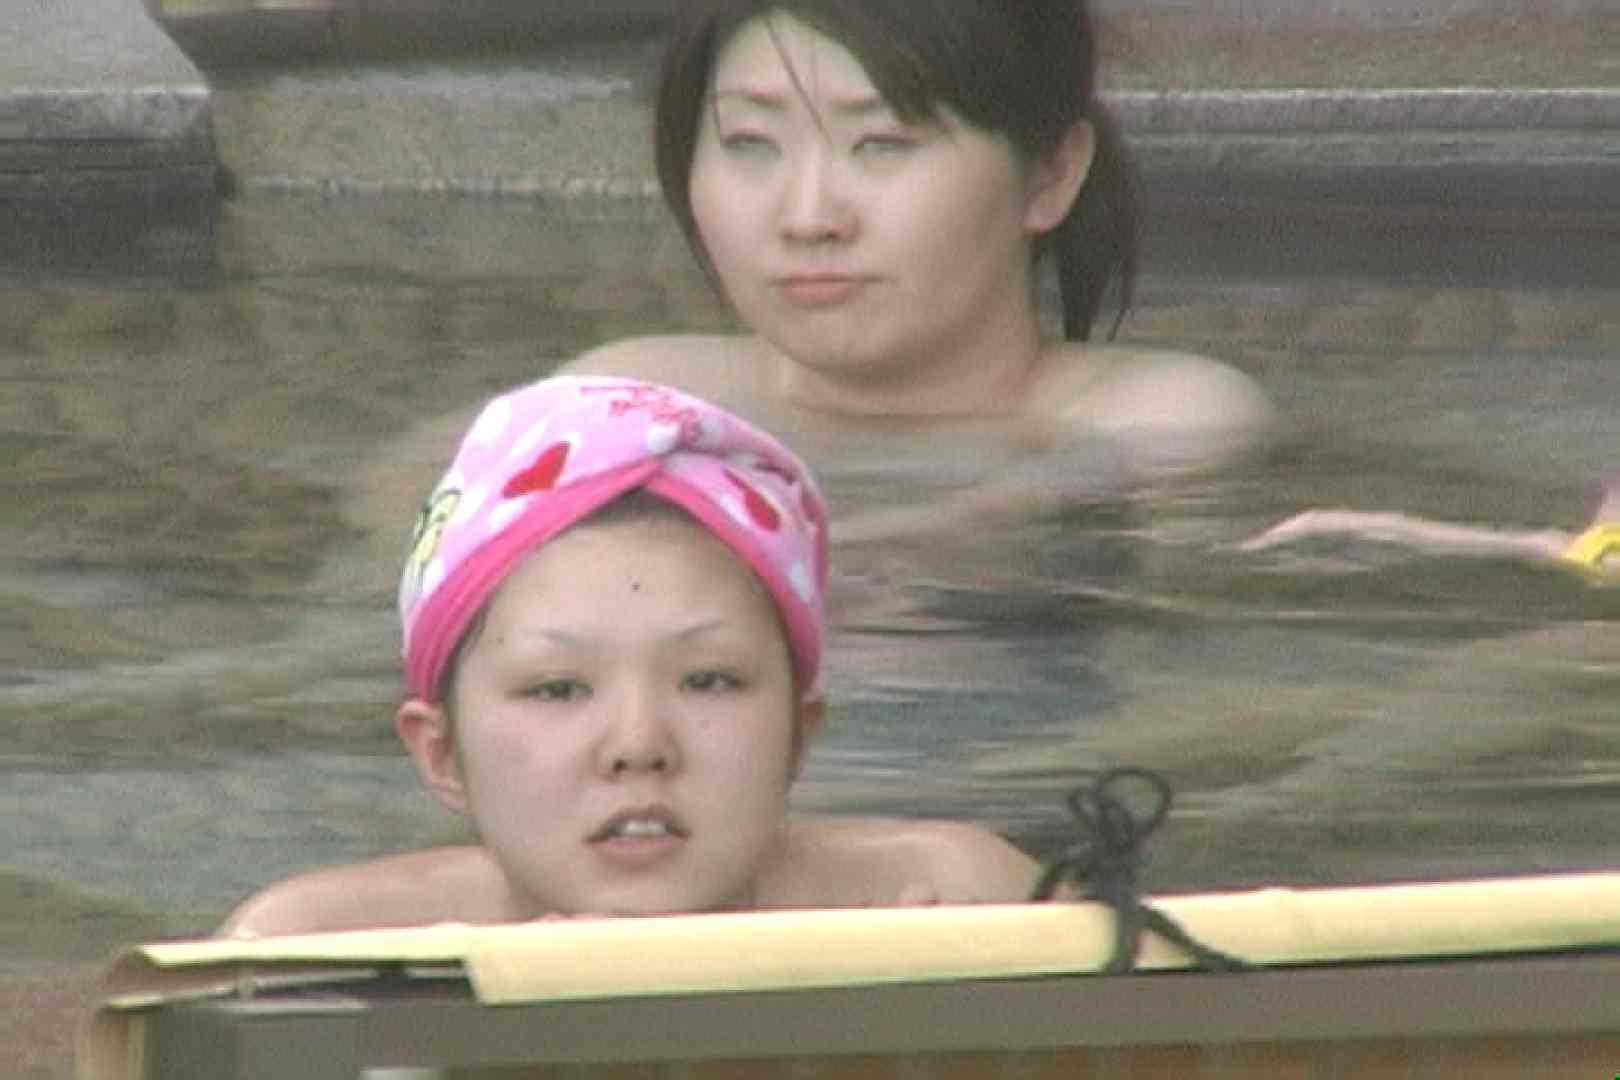 Aquaな露天風呂Vol.25 0 | 0  47連発 27